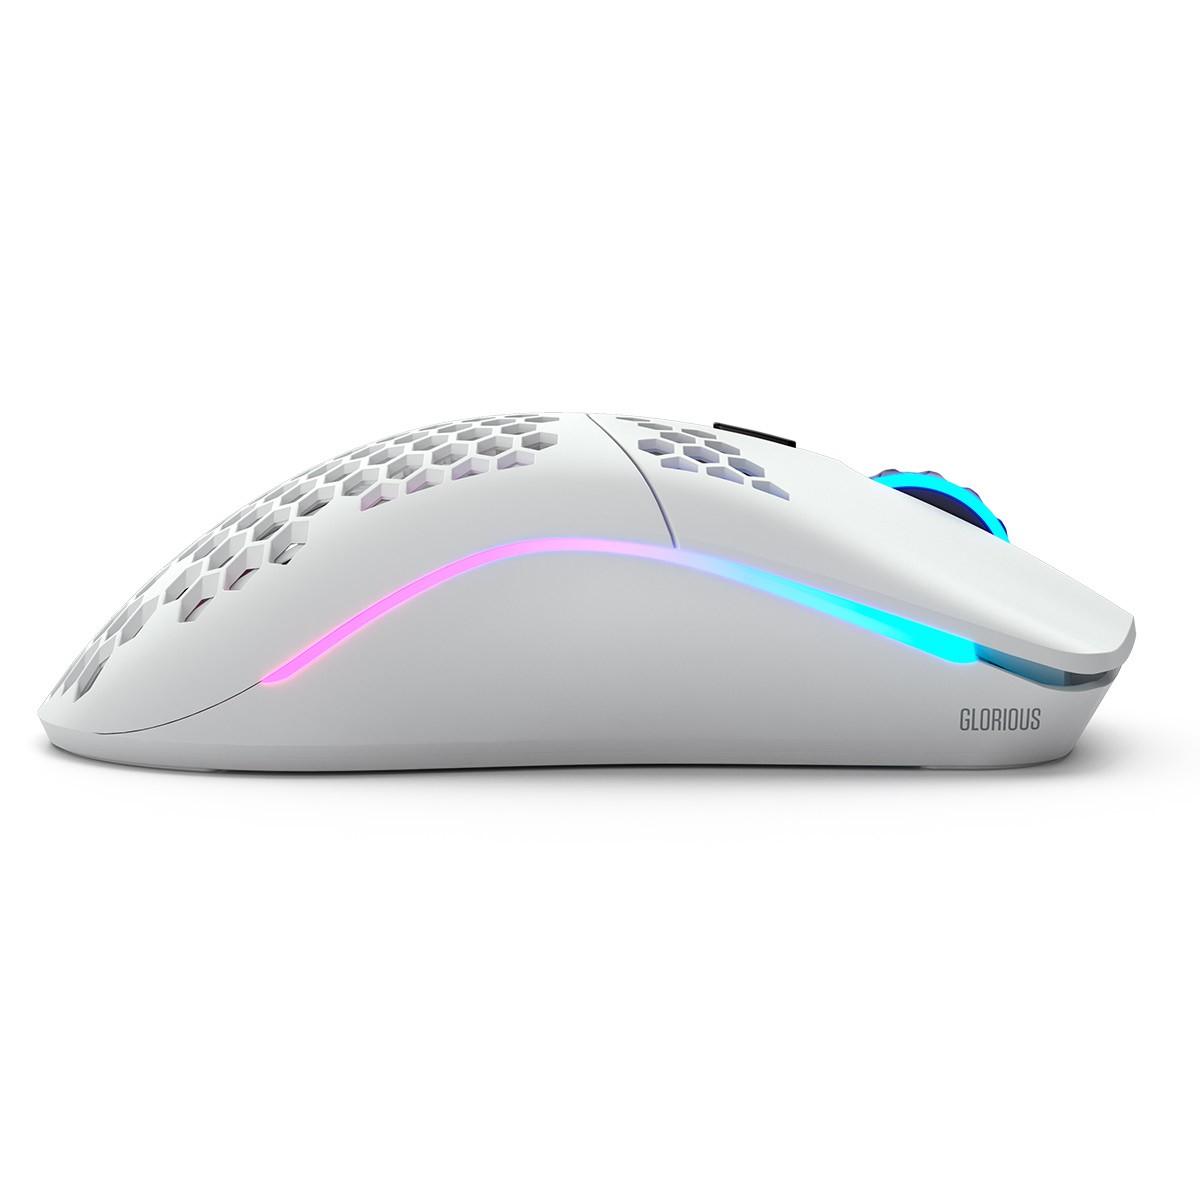 Glorious PC Gaming Race Model O belaidė pelė (matinė, balta) | 19 000 DPI